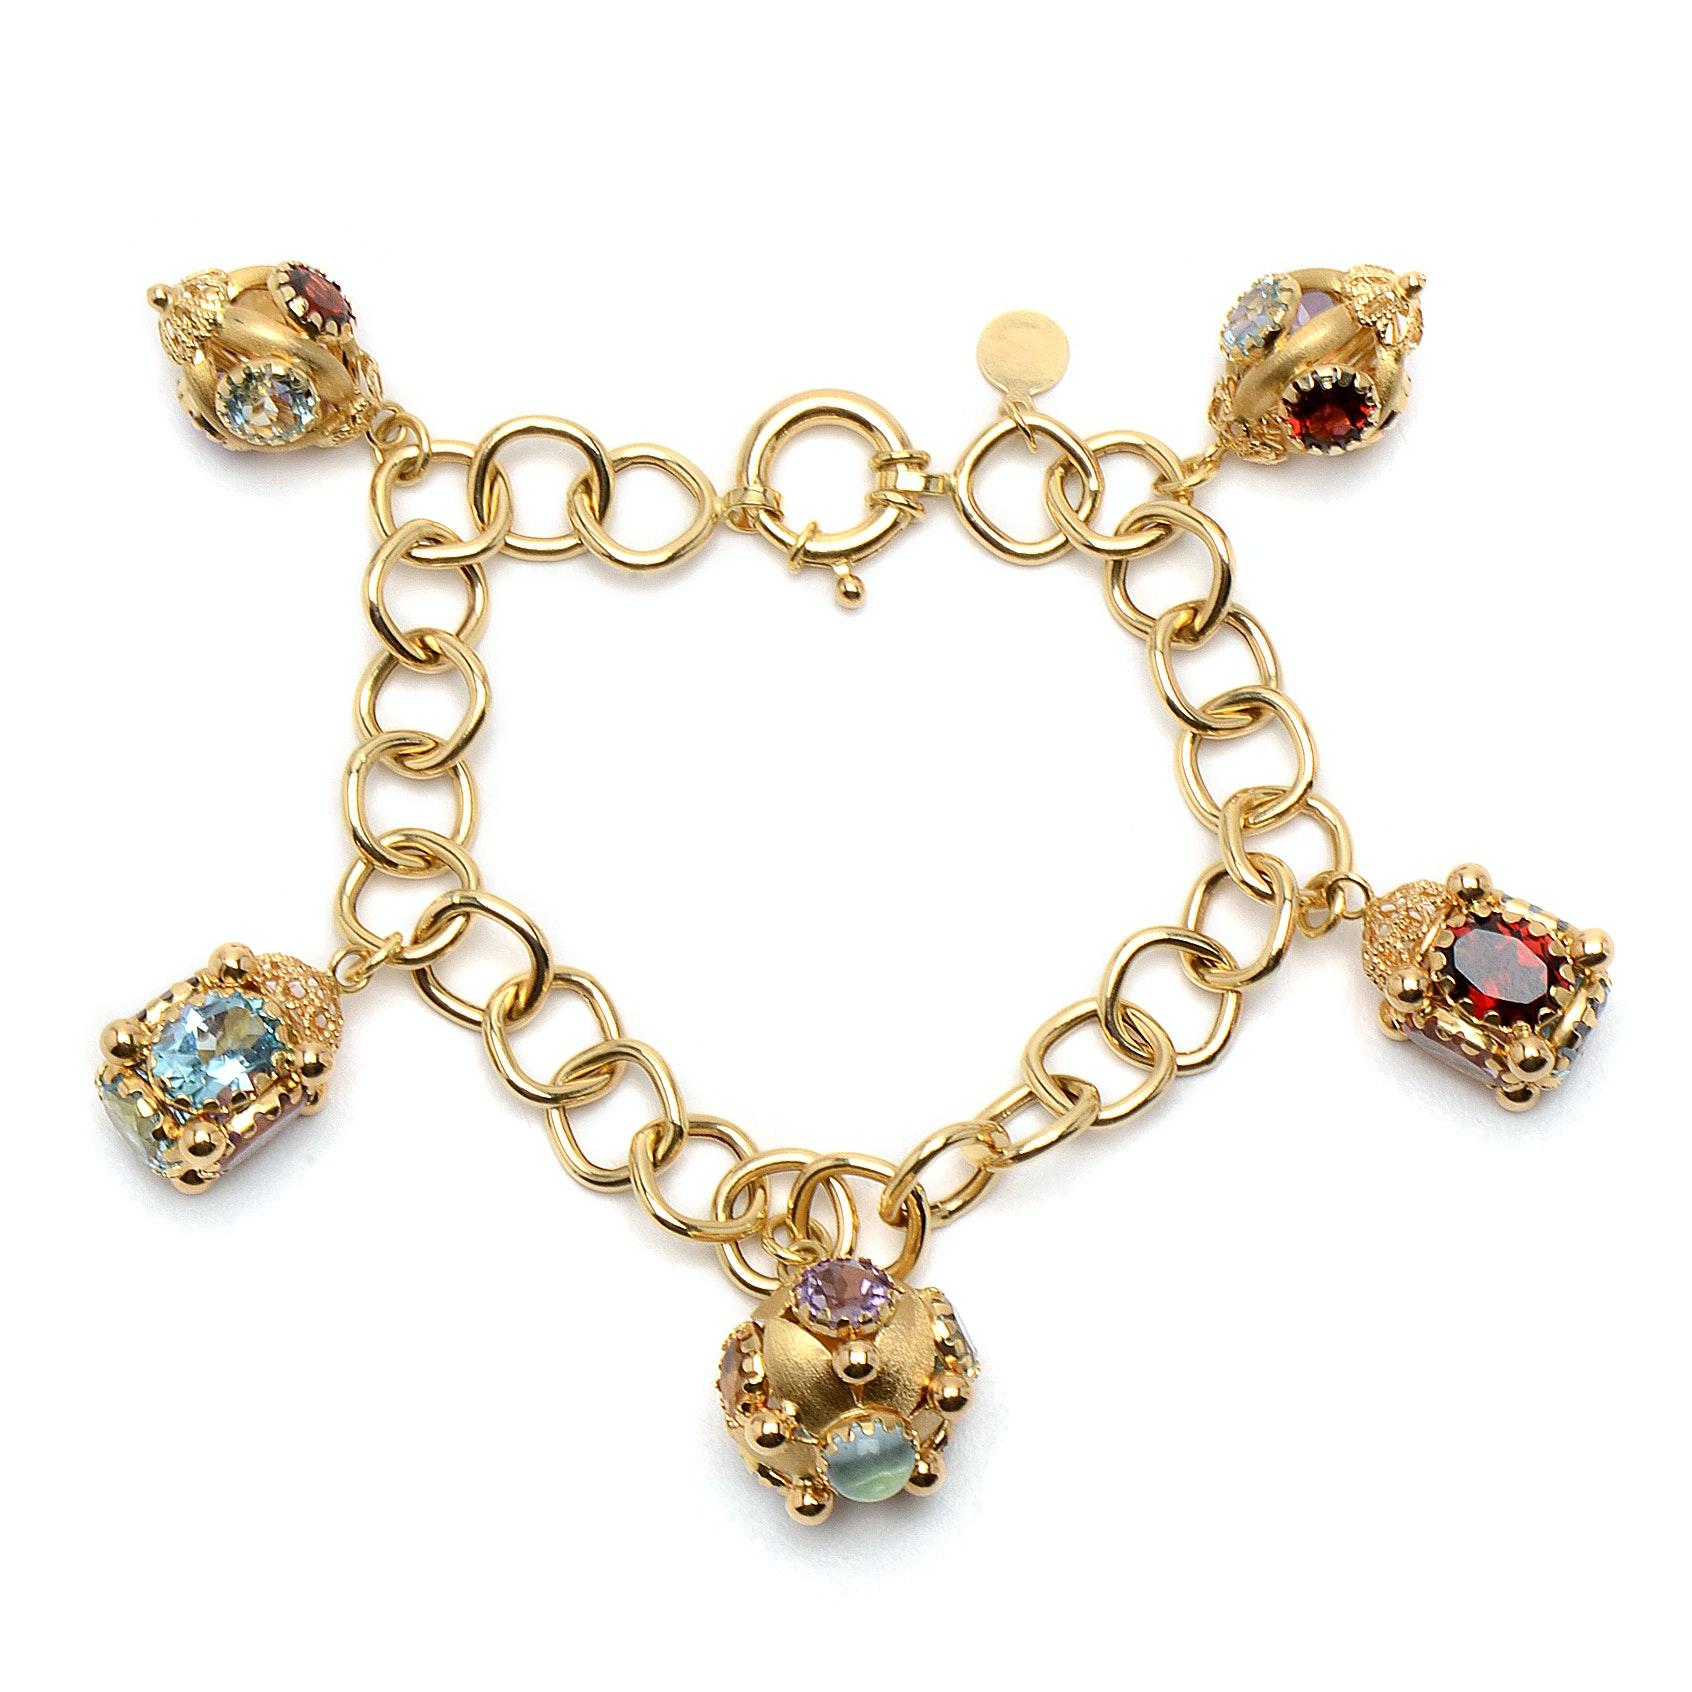 18K Yellow Gold Multiple Gemstone Charm Bracelet